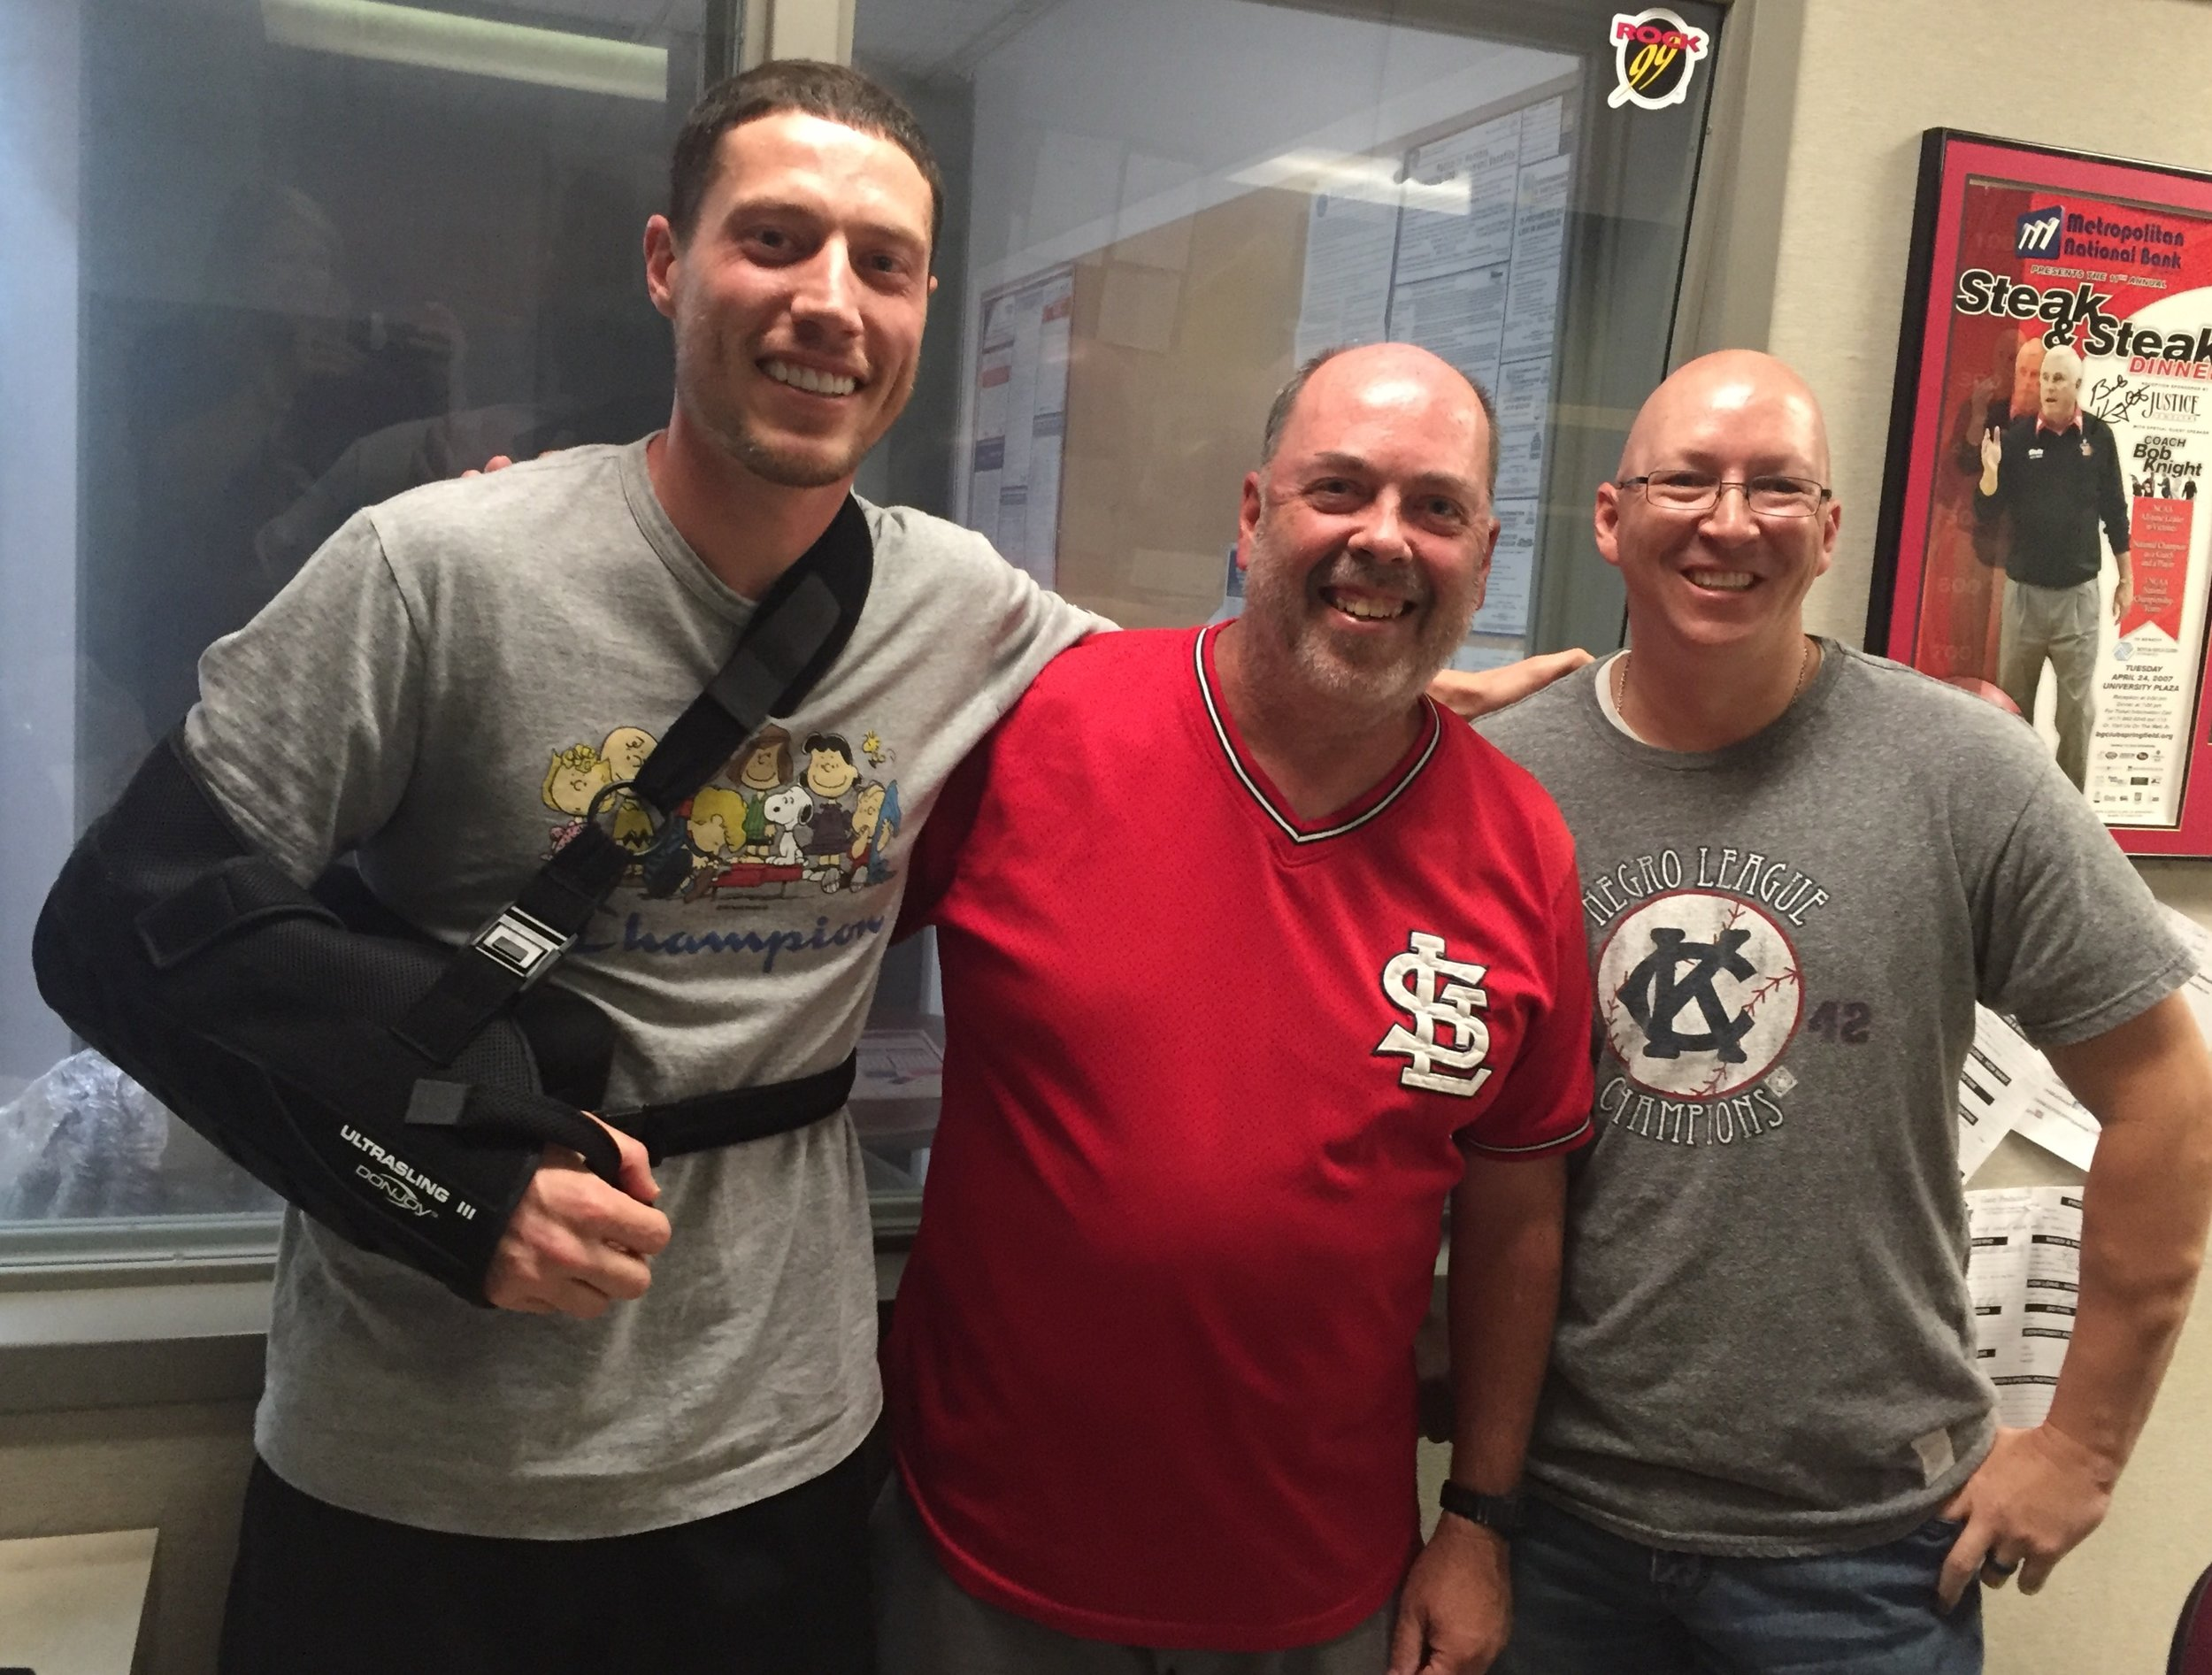 Lucas Harrell, Don Louzader, and Ethan Bryan